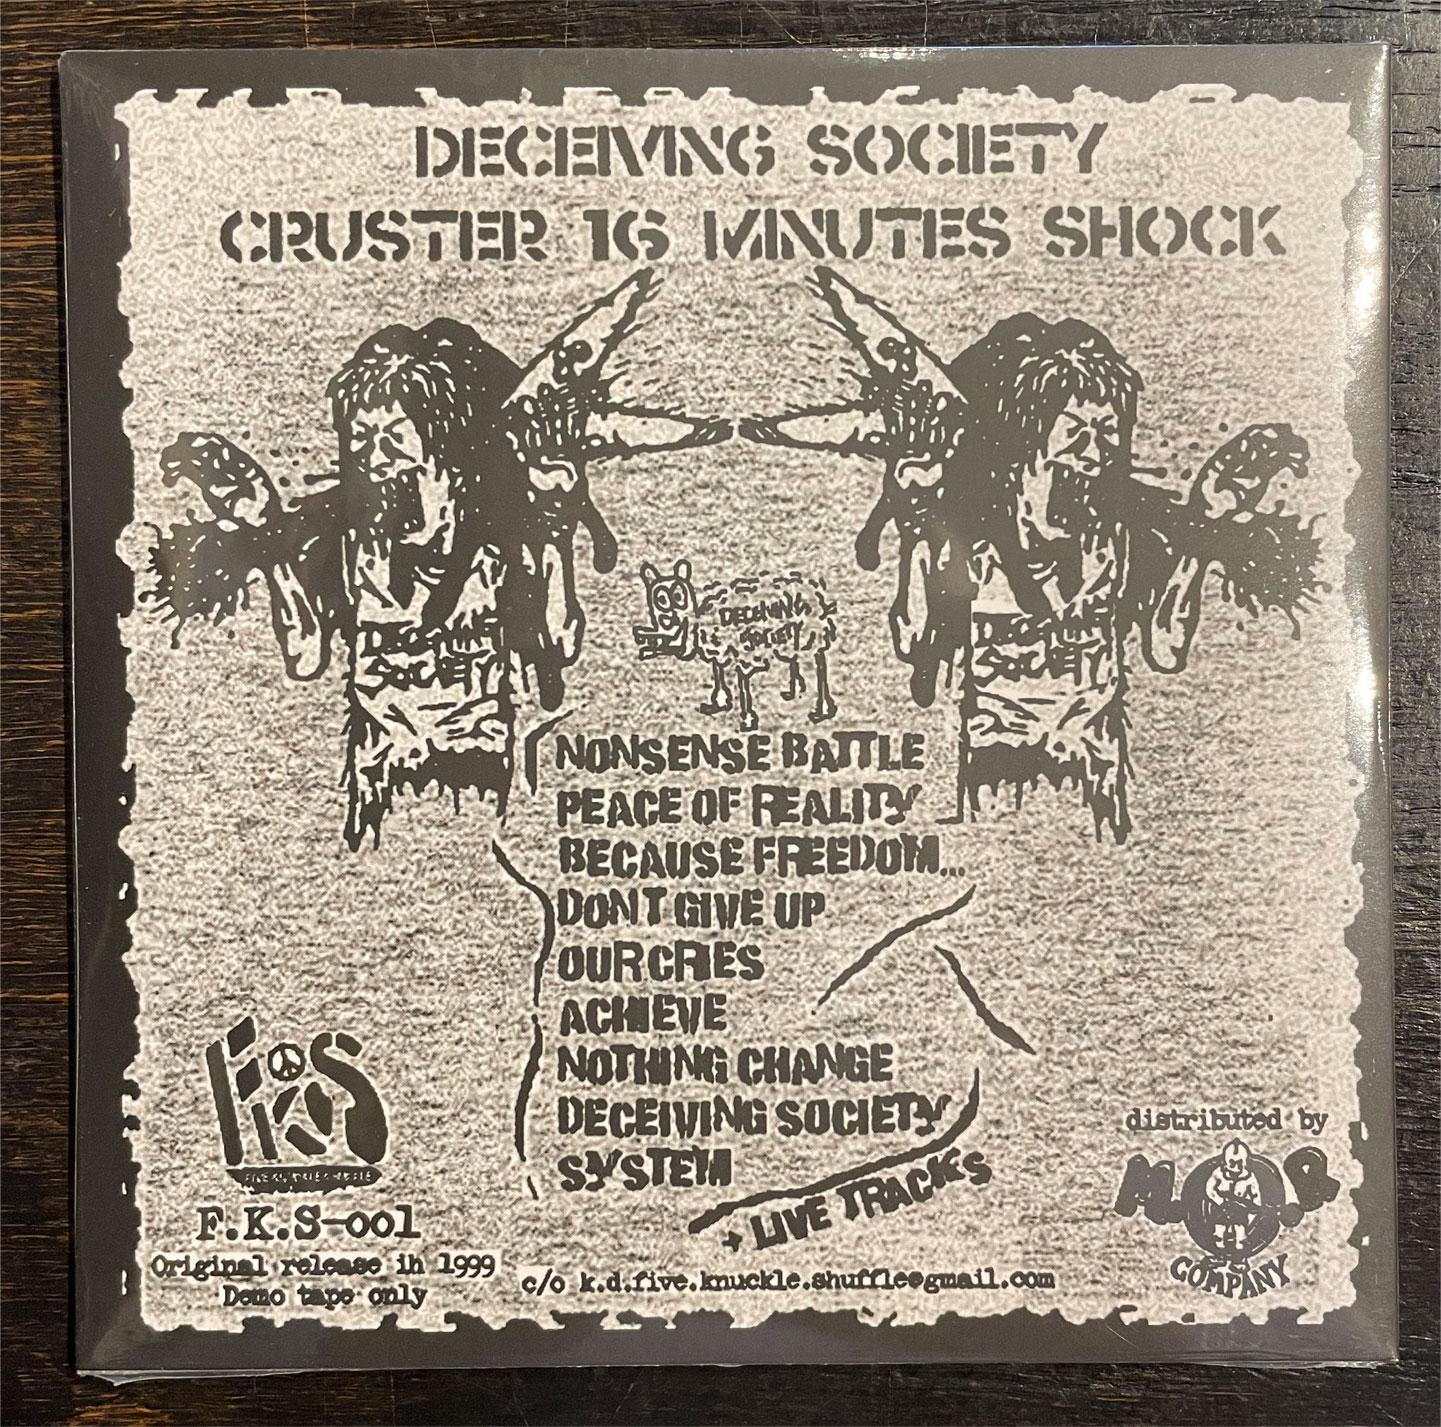 DECEIVING SOCIETY CD CRUSTER 16 MINUTES SHOCK (LTD.500)